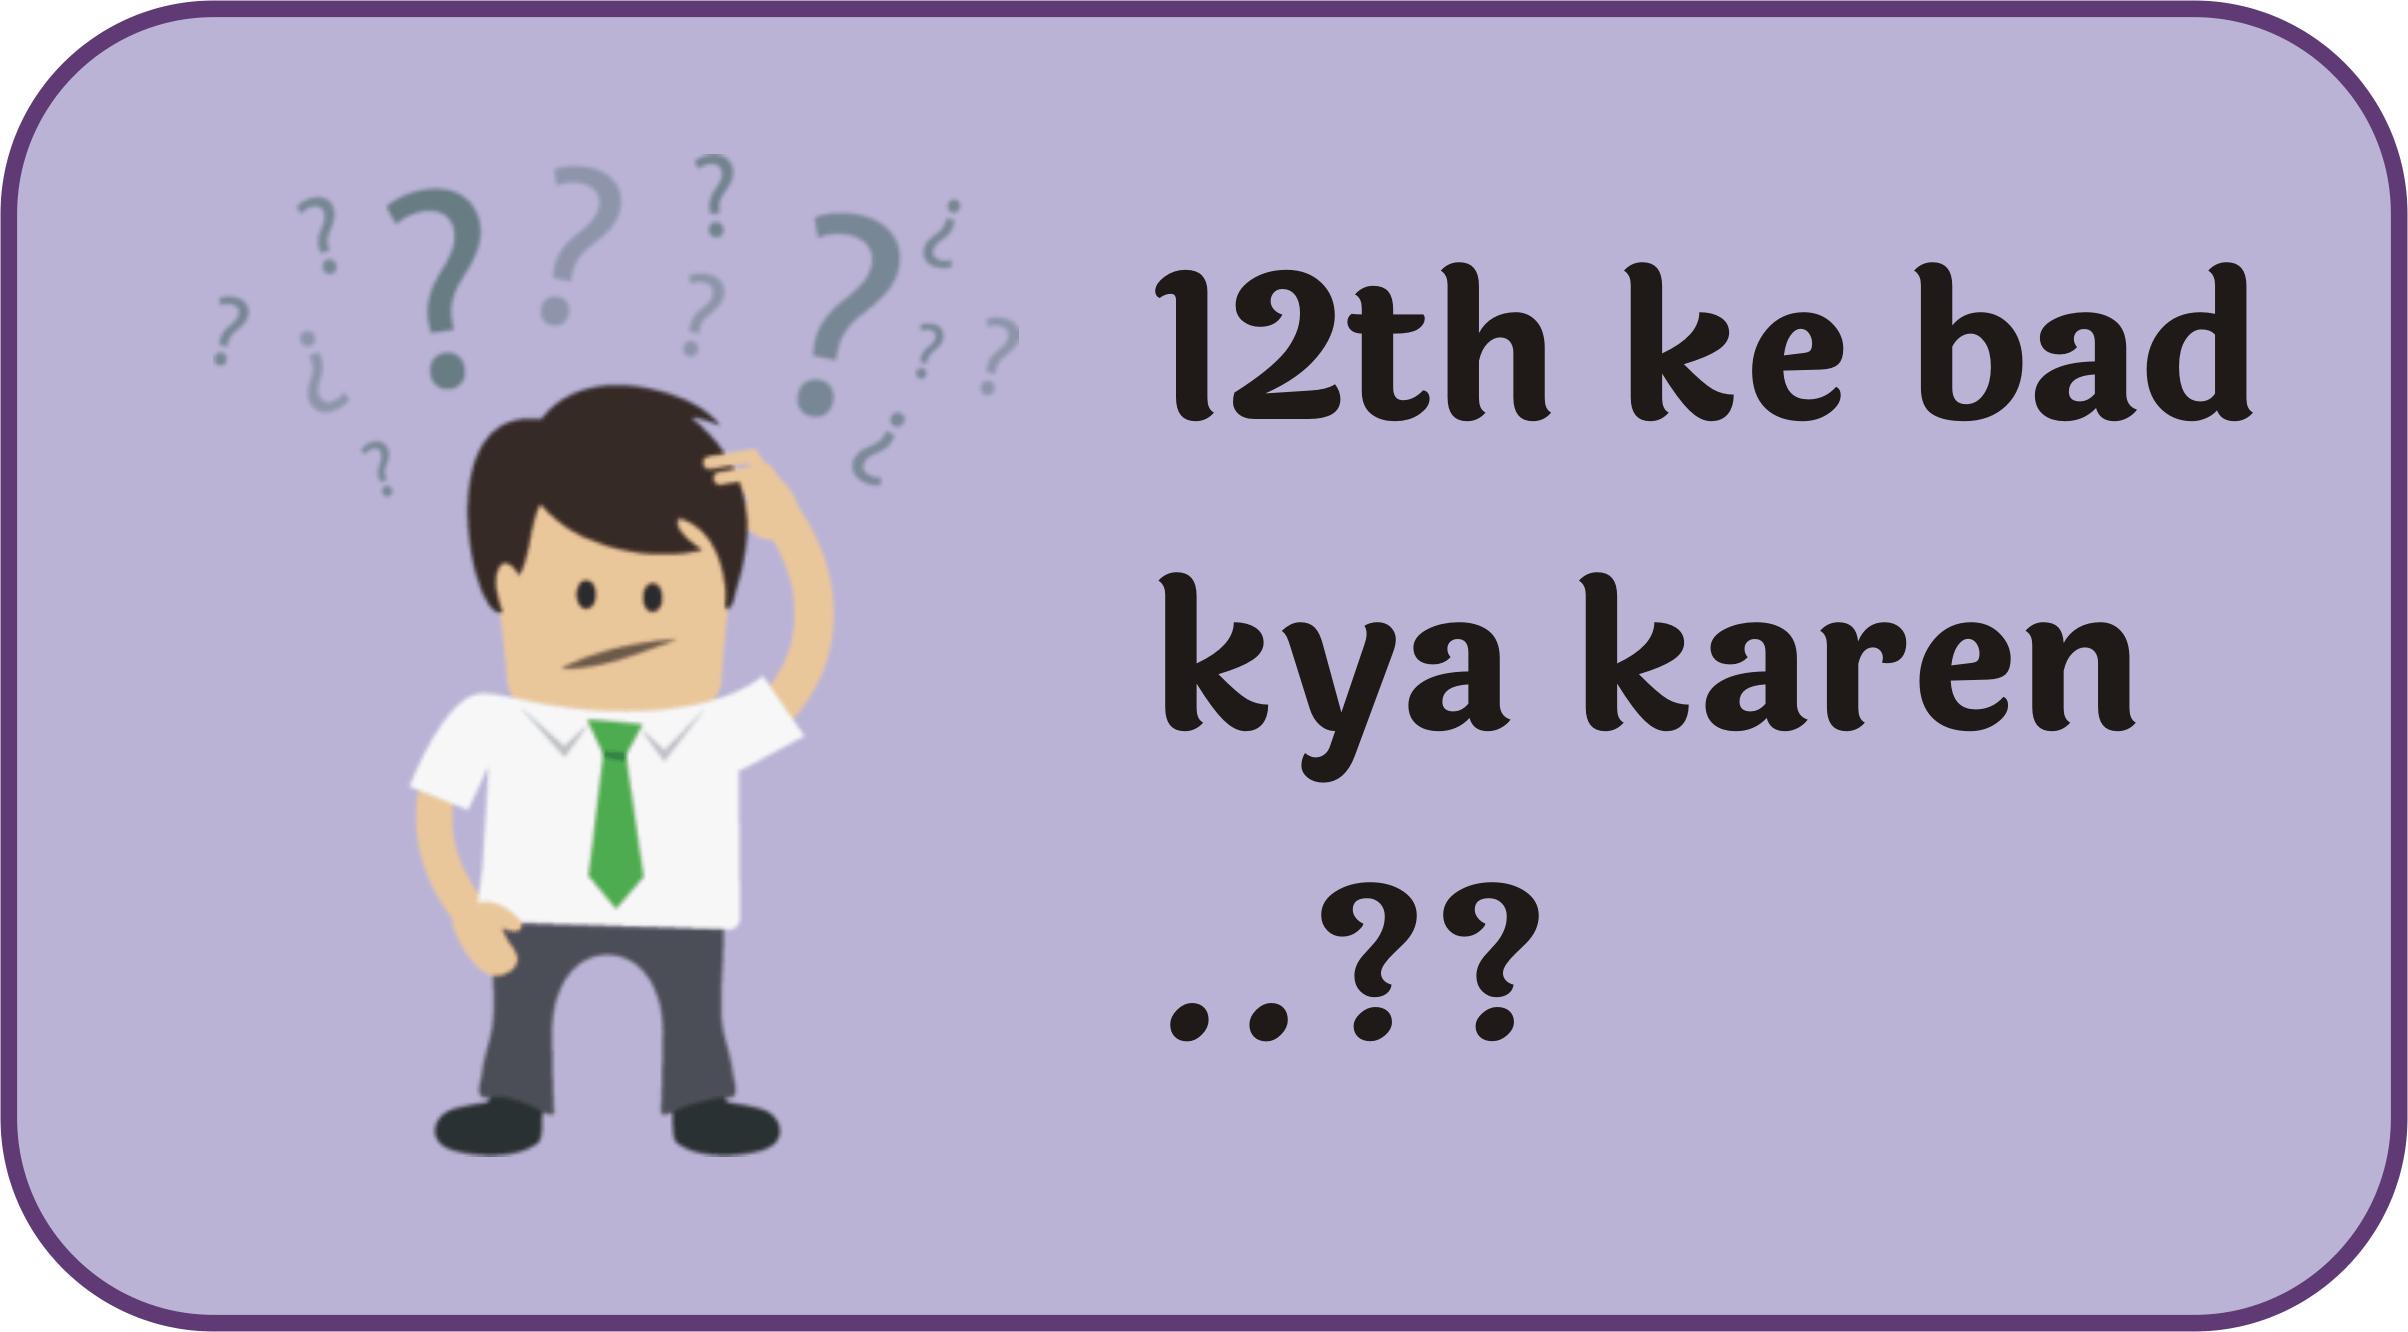 12 Ke Baad Kya Kare